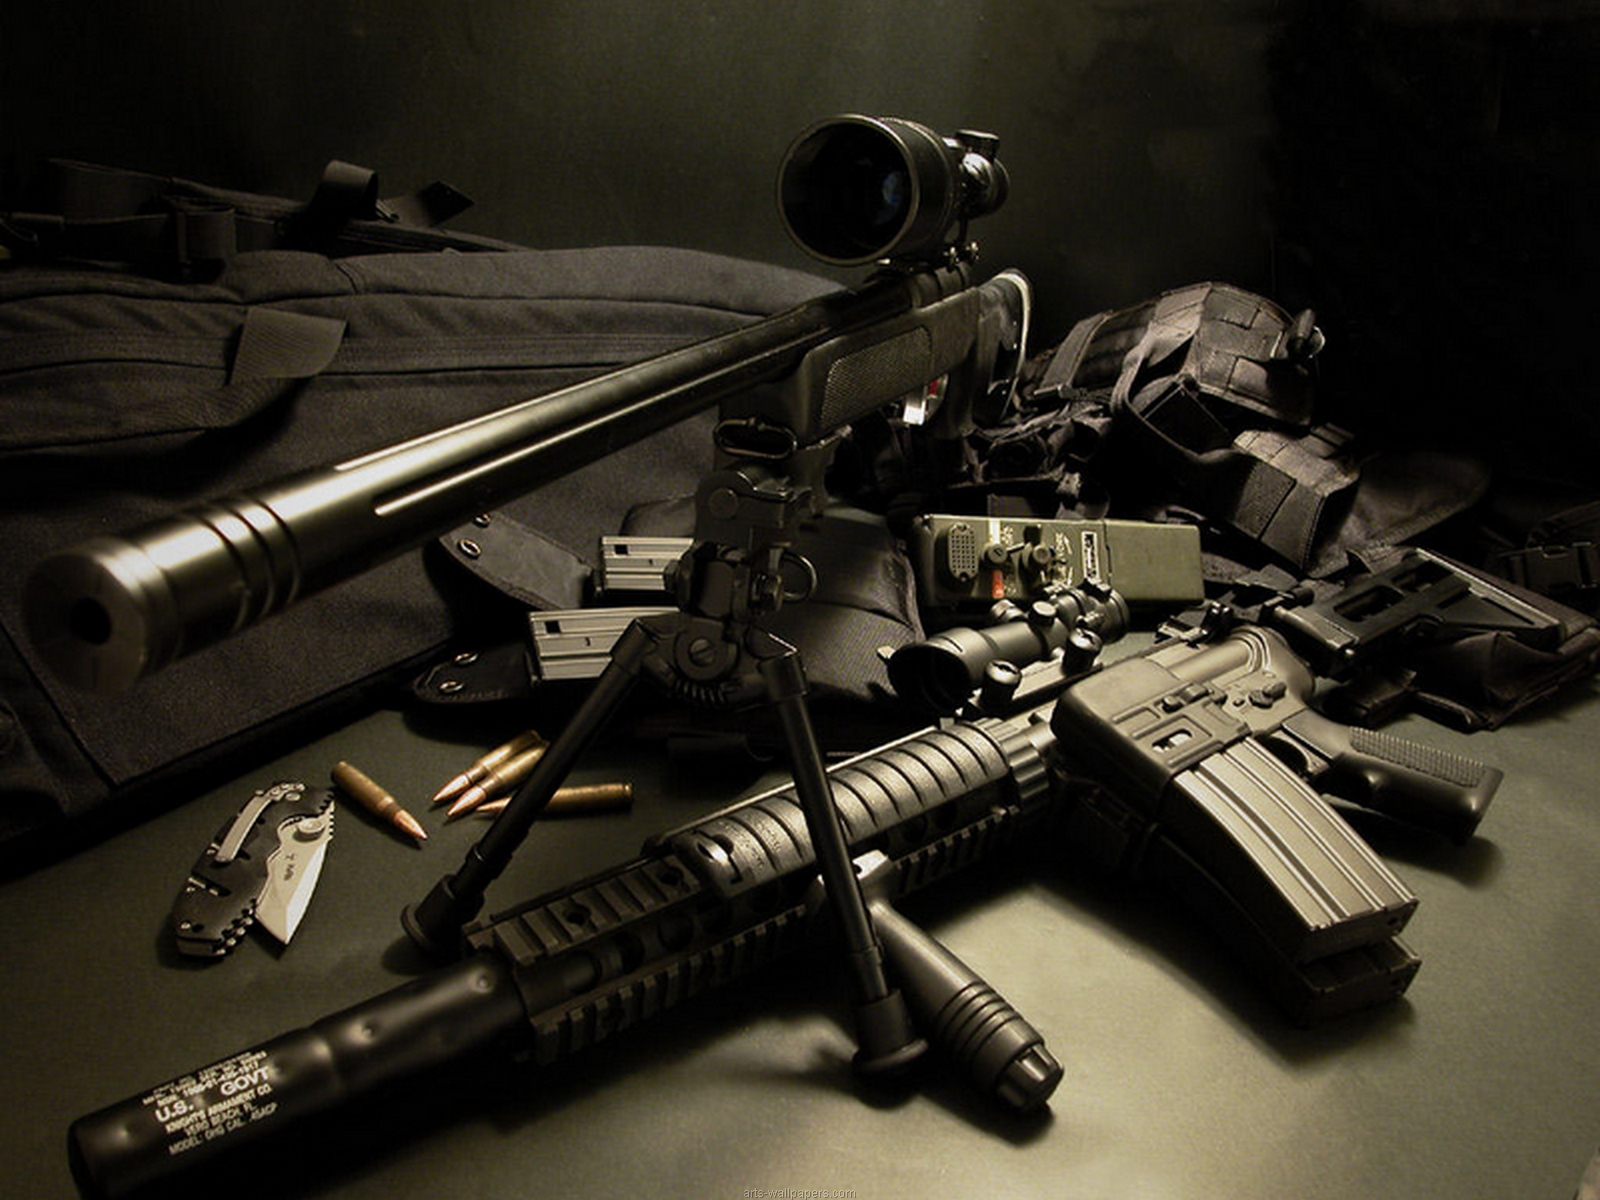 Guns Weapons Wallpapers Guns Weapons Wallpaper 27JPG 1600 x 1200 1600x1200